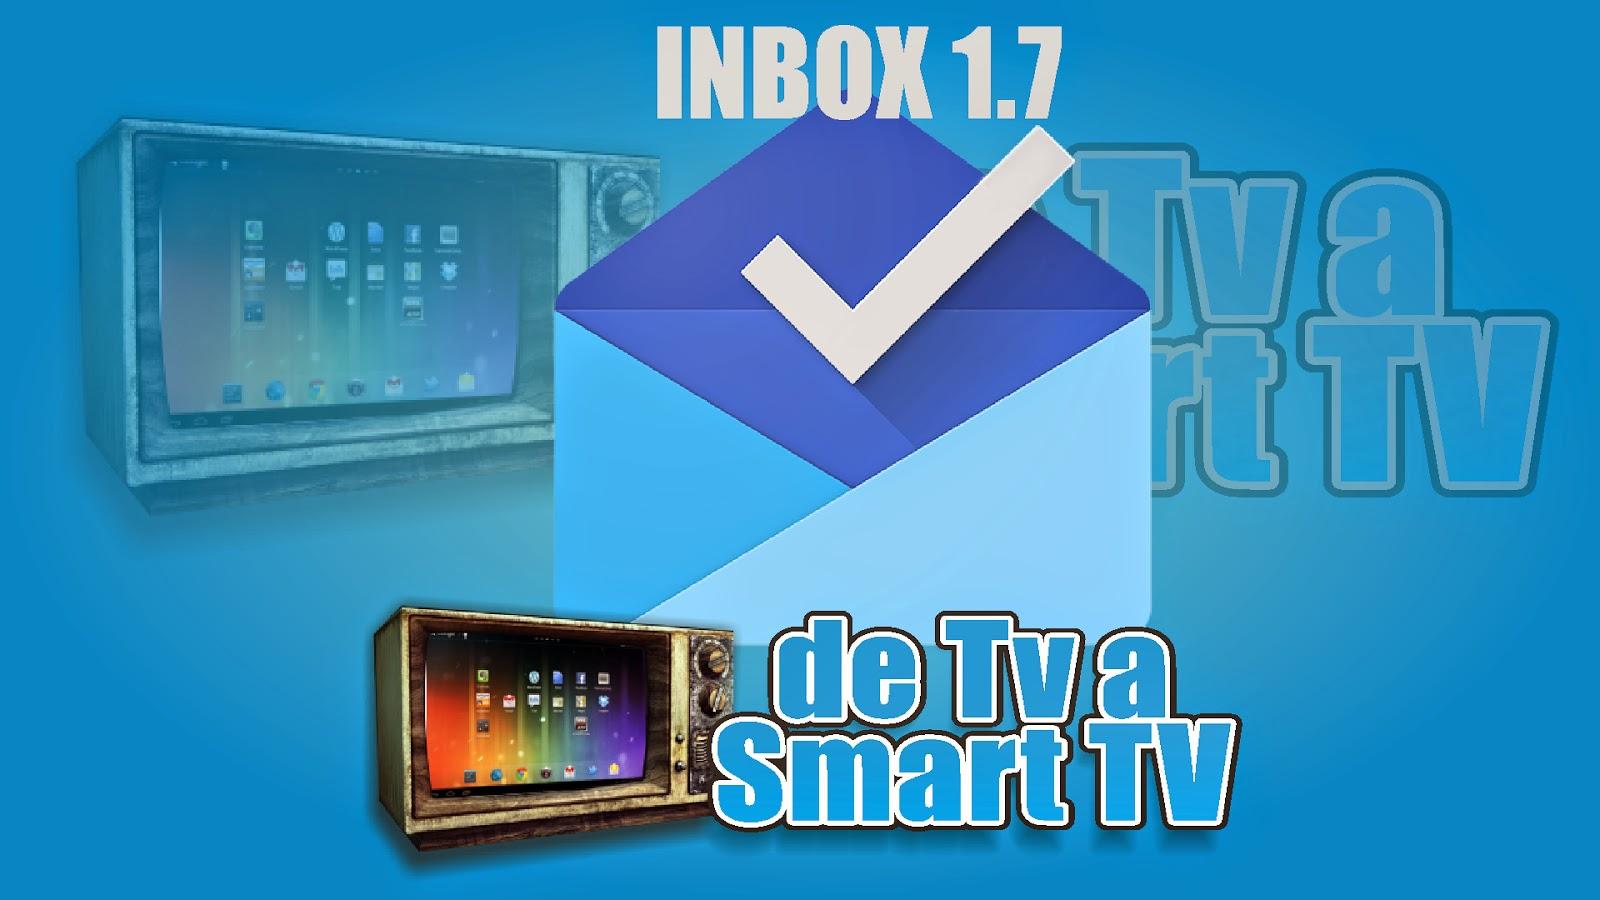 Inbox 1.7